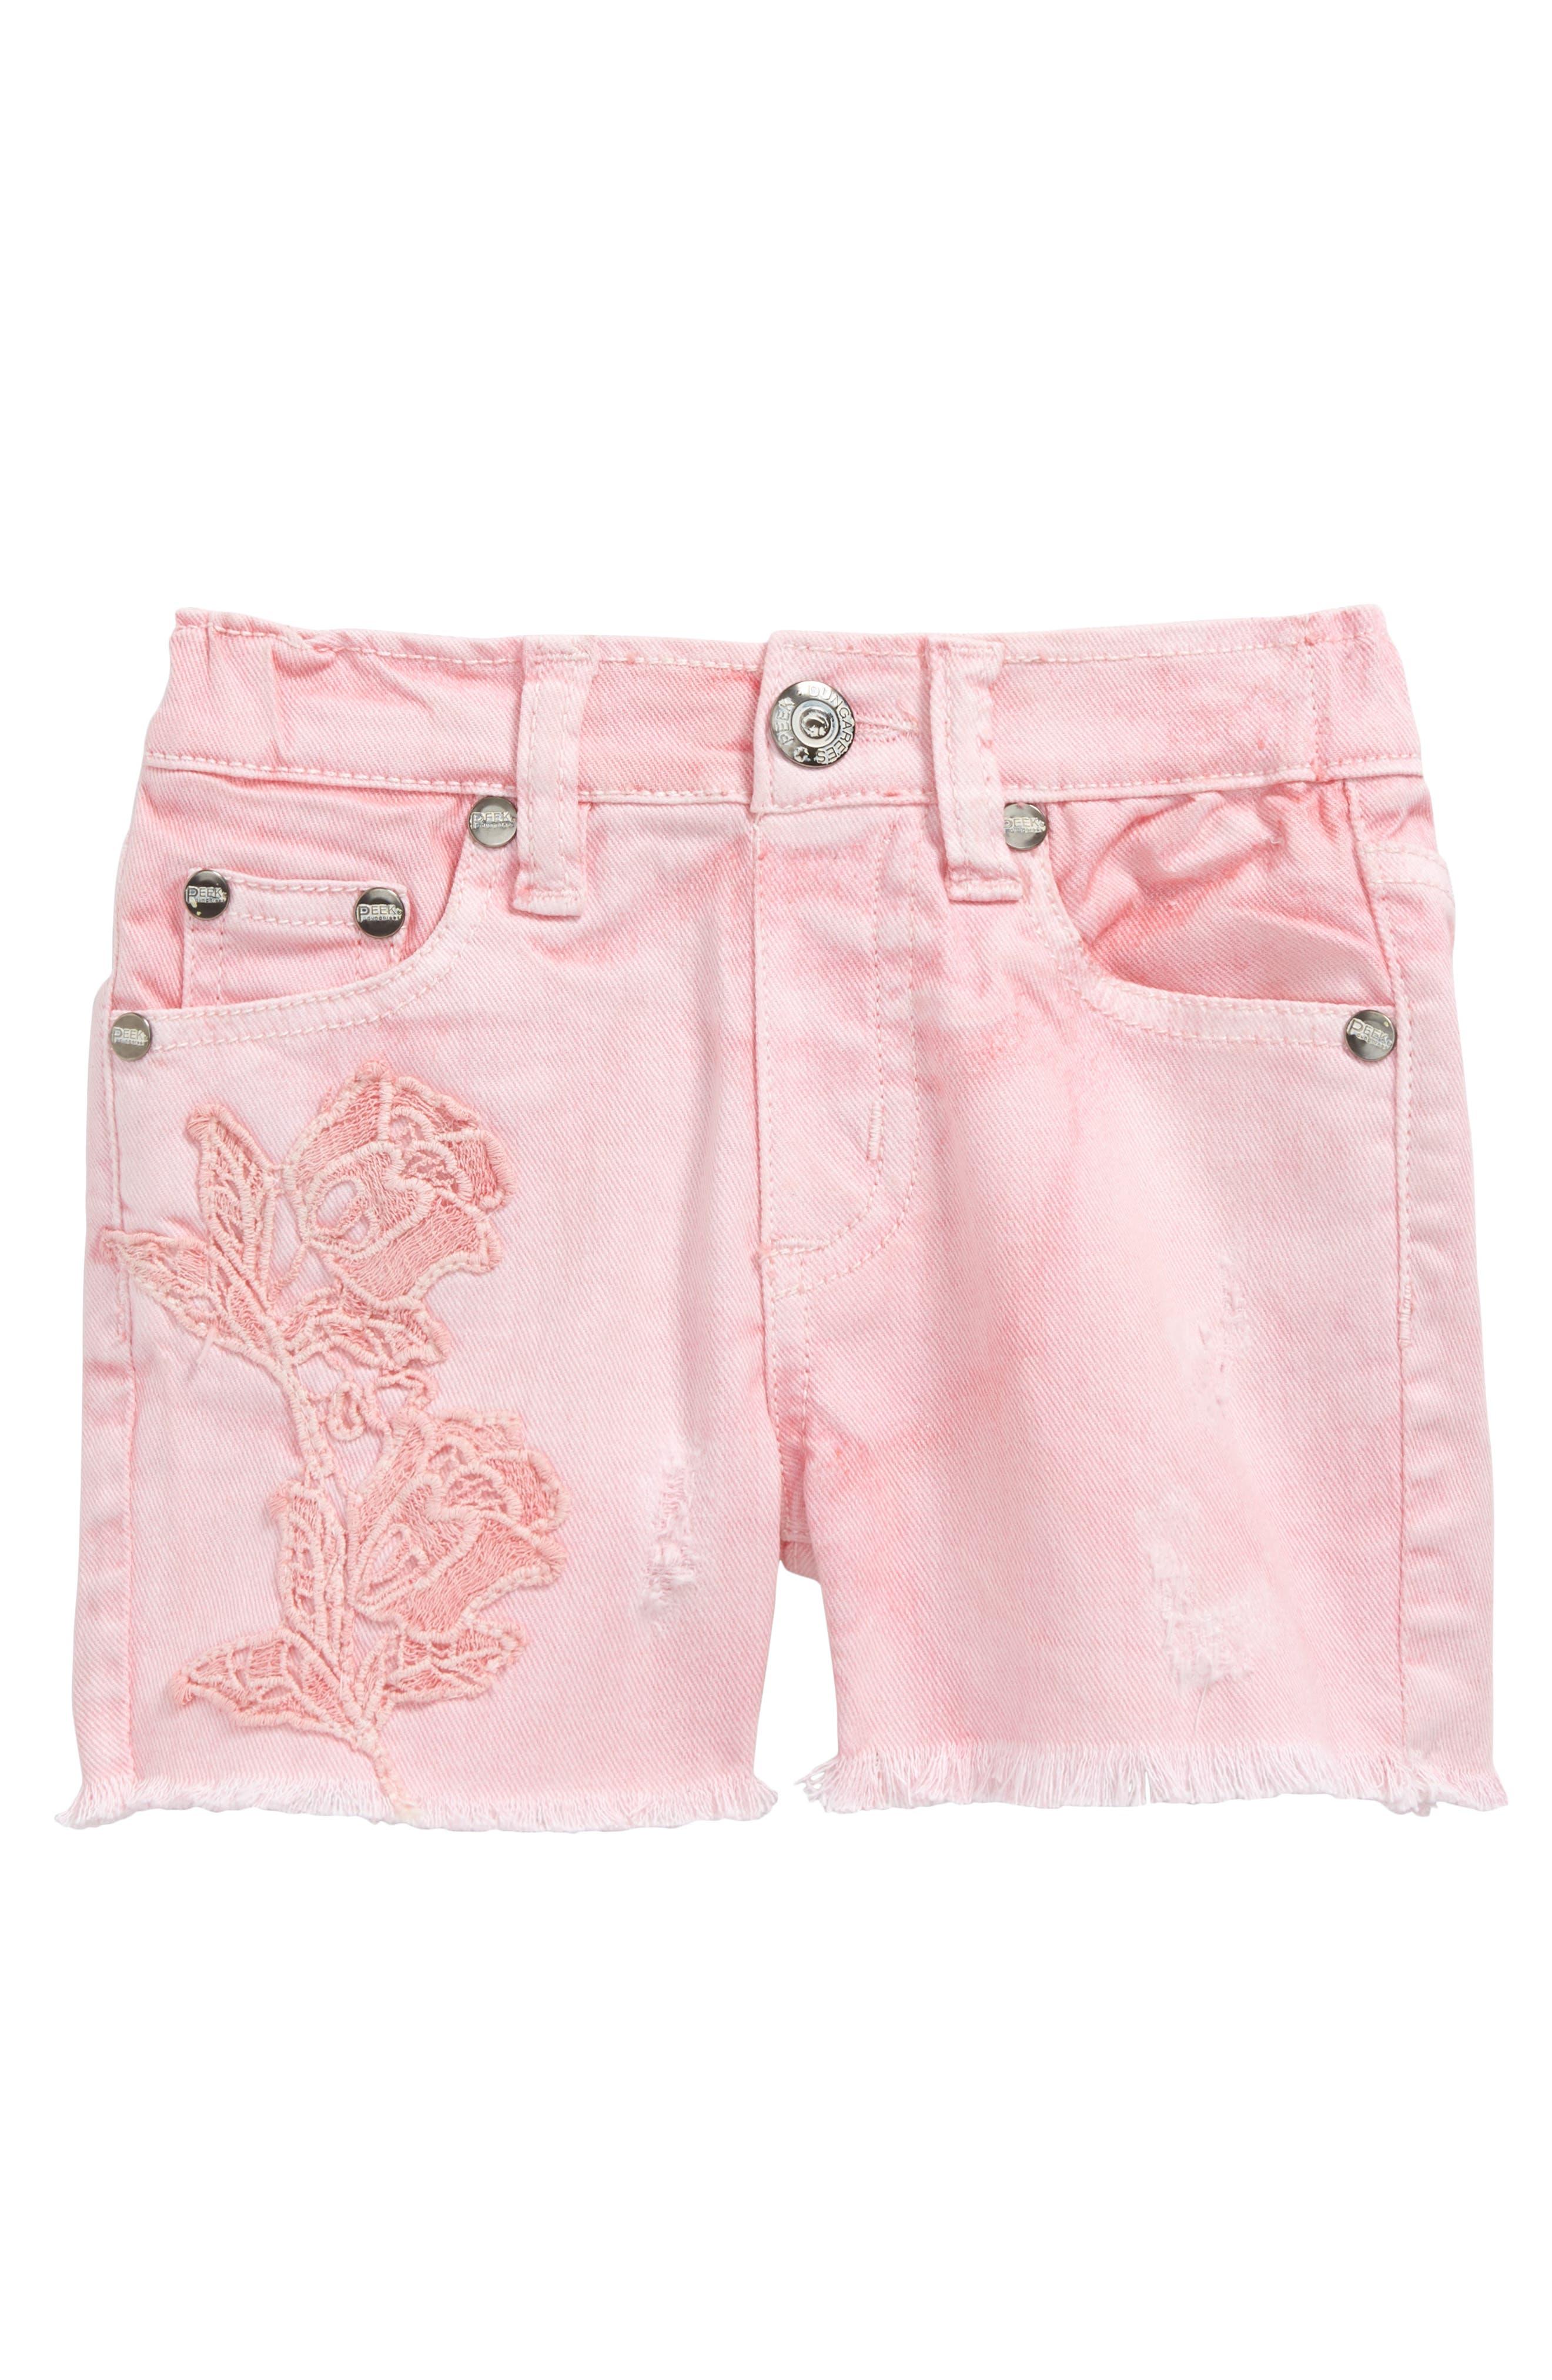 Griffin Cutoff Denim Shorts,                             Main thumbnail 1, color,                             Pink